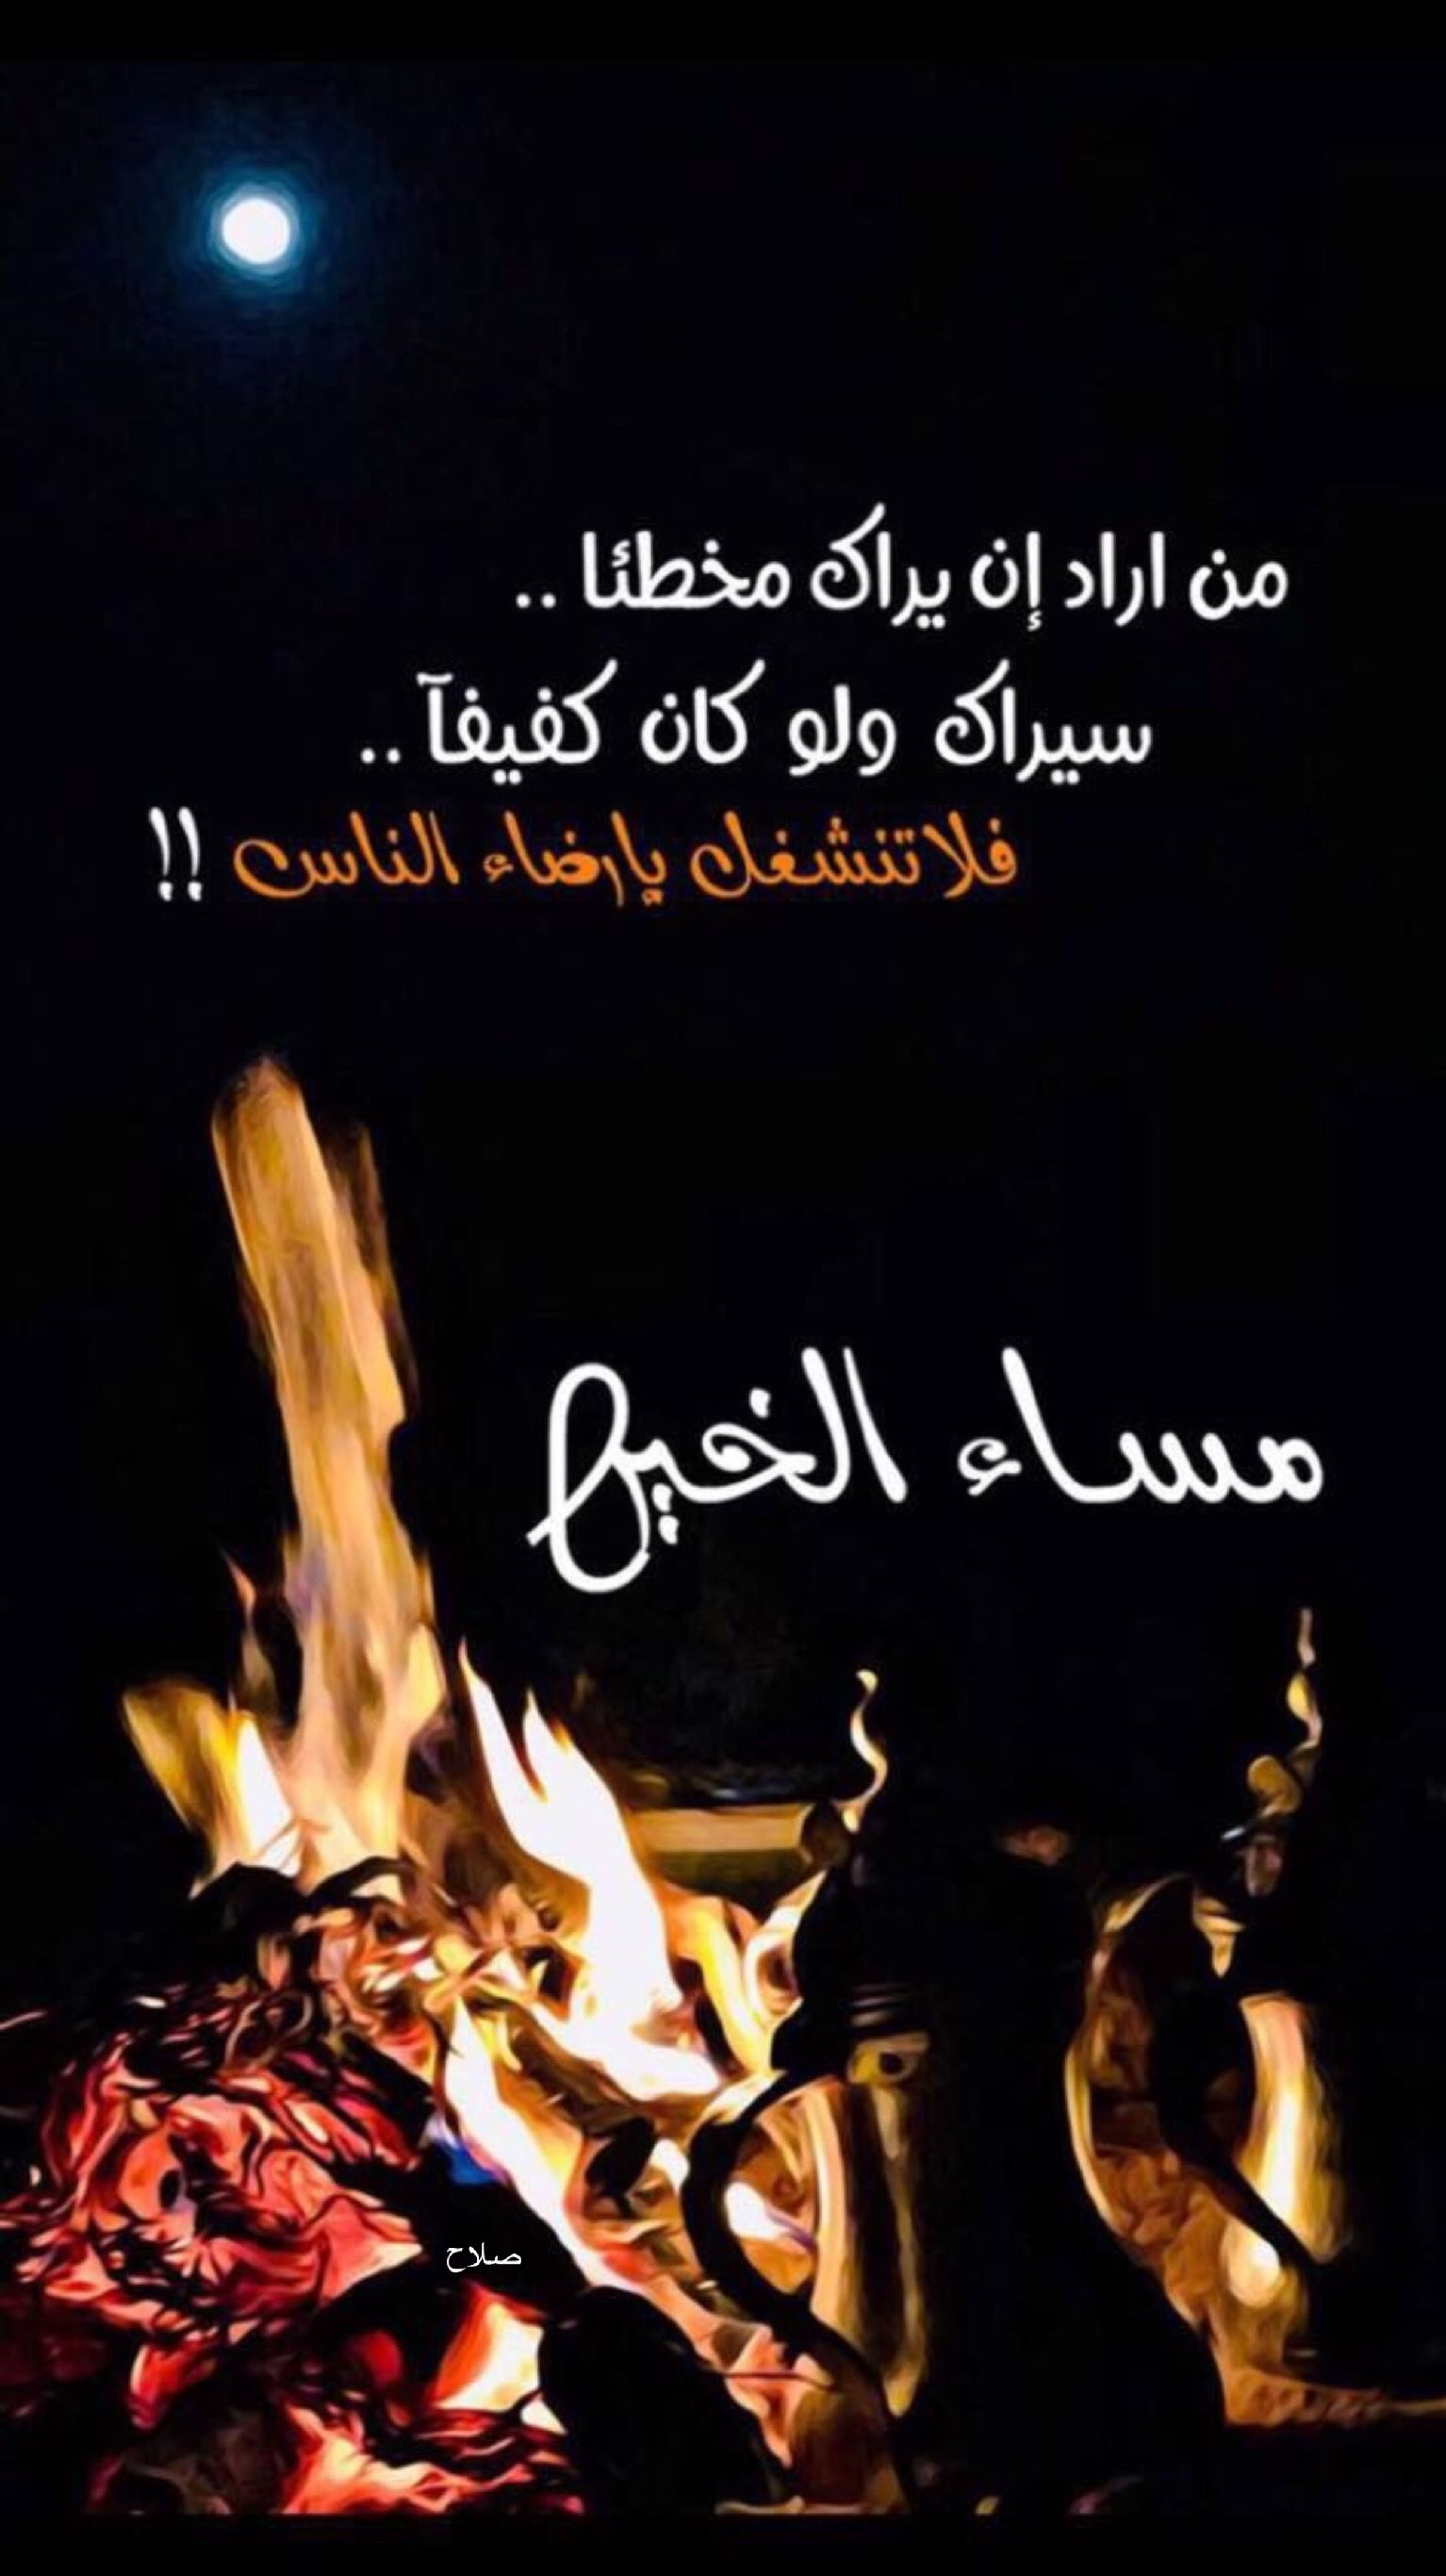 Pin By Salah Mahjoub On مساء الخير Romantic Love Quotes Love Words Funny Babies